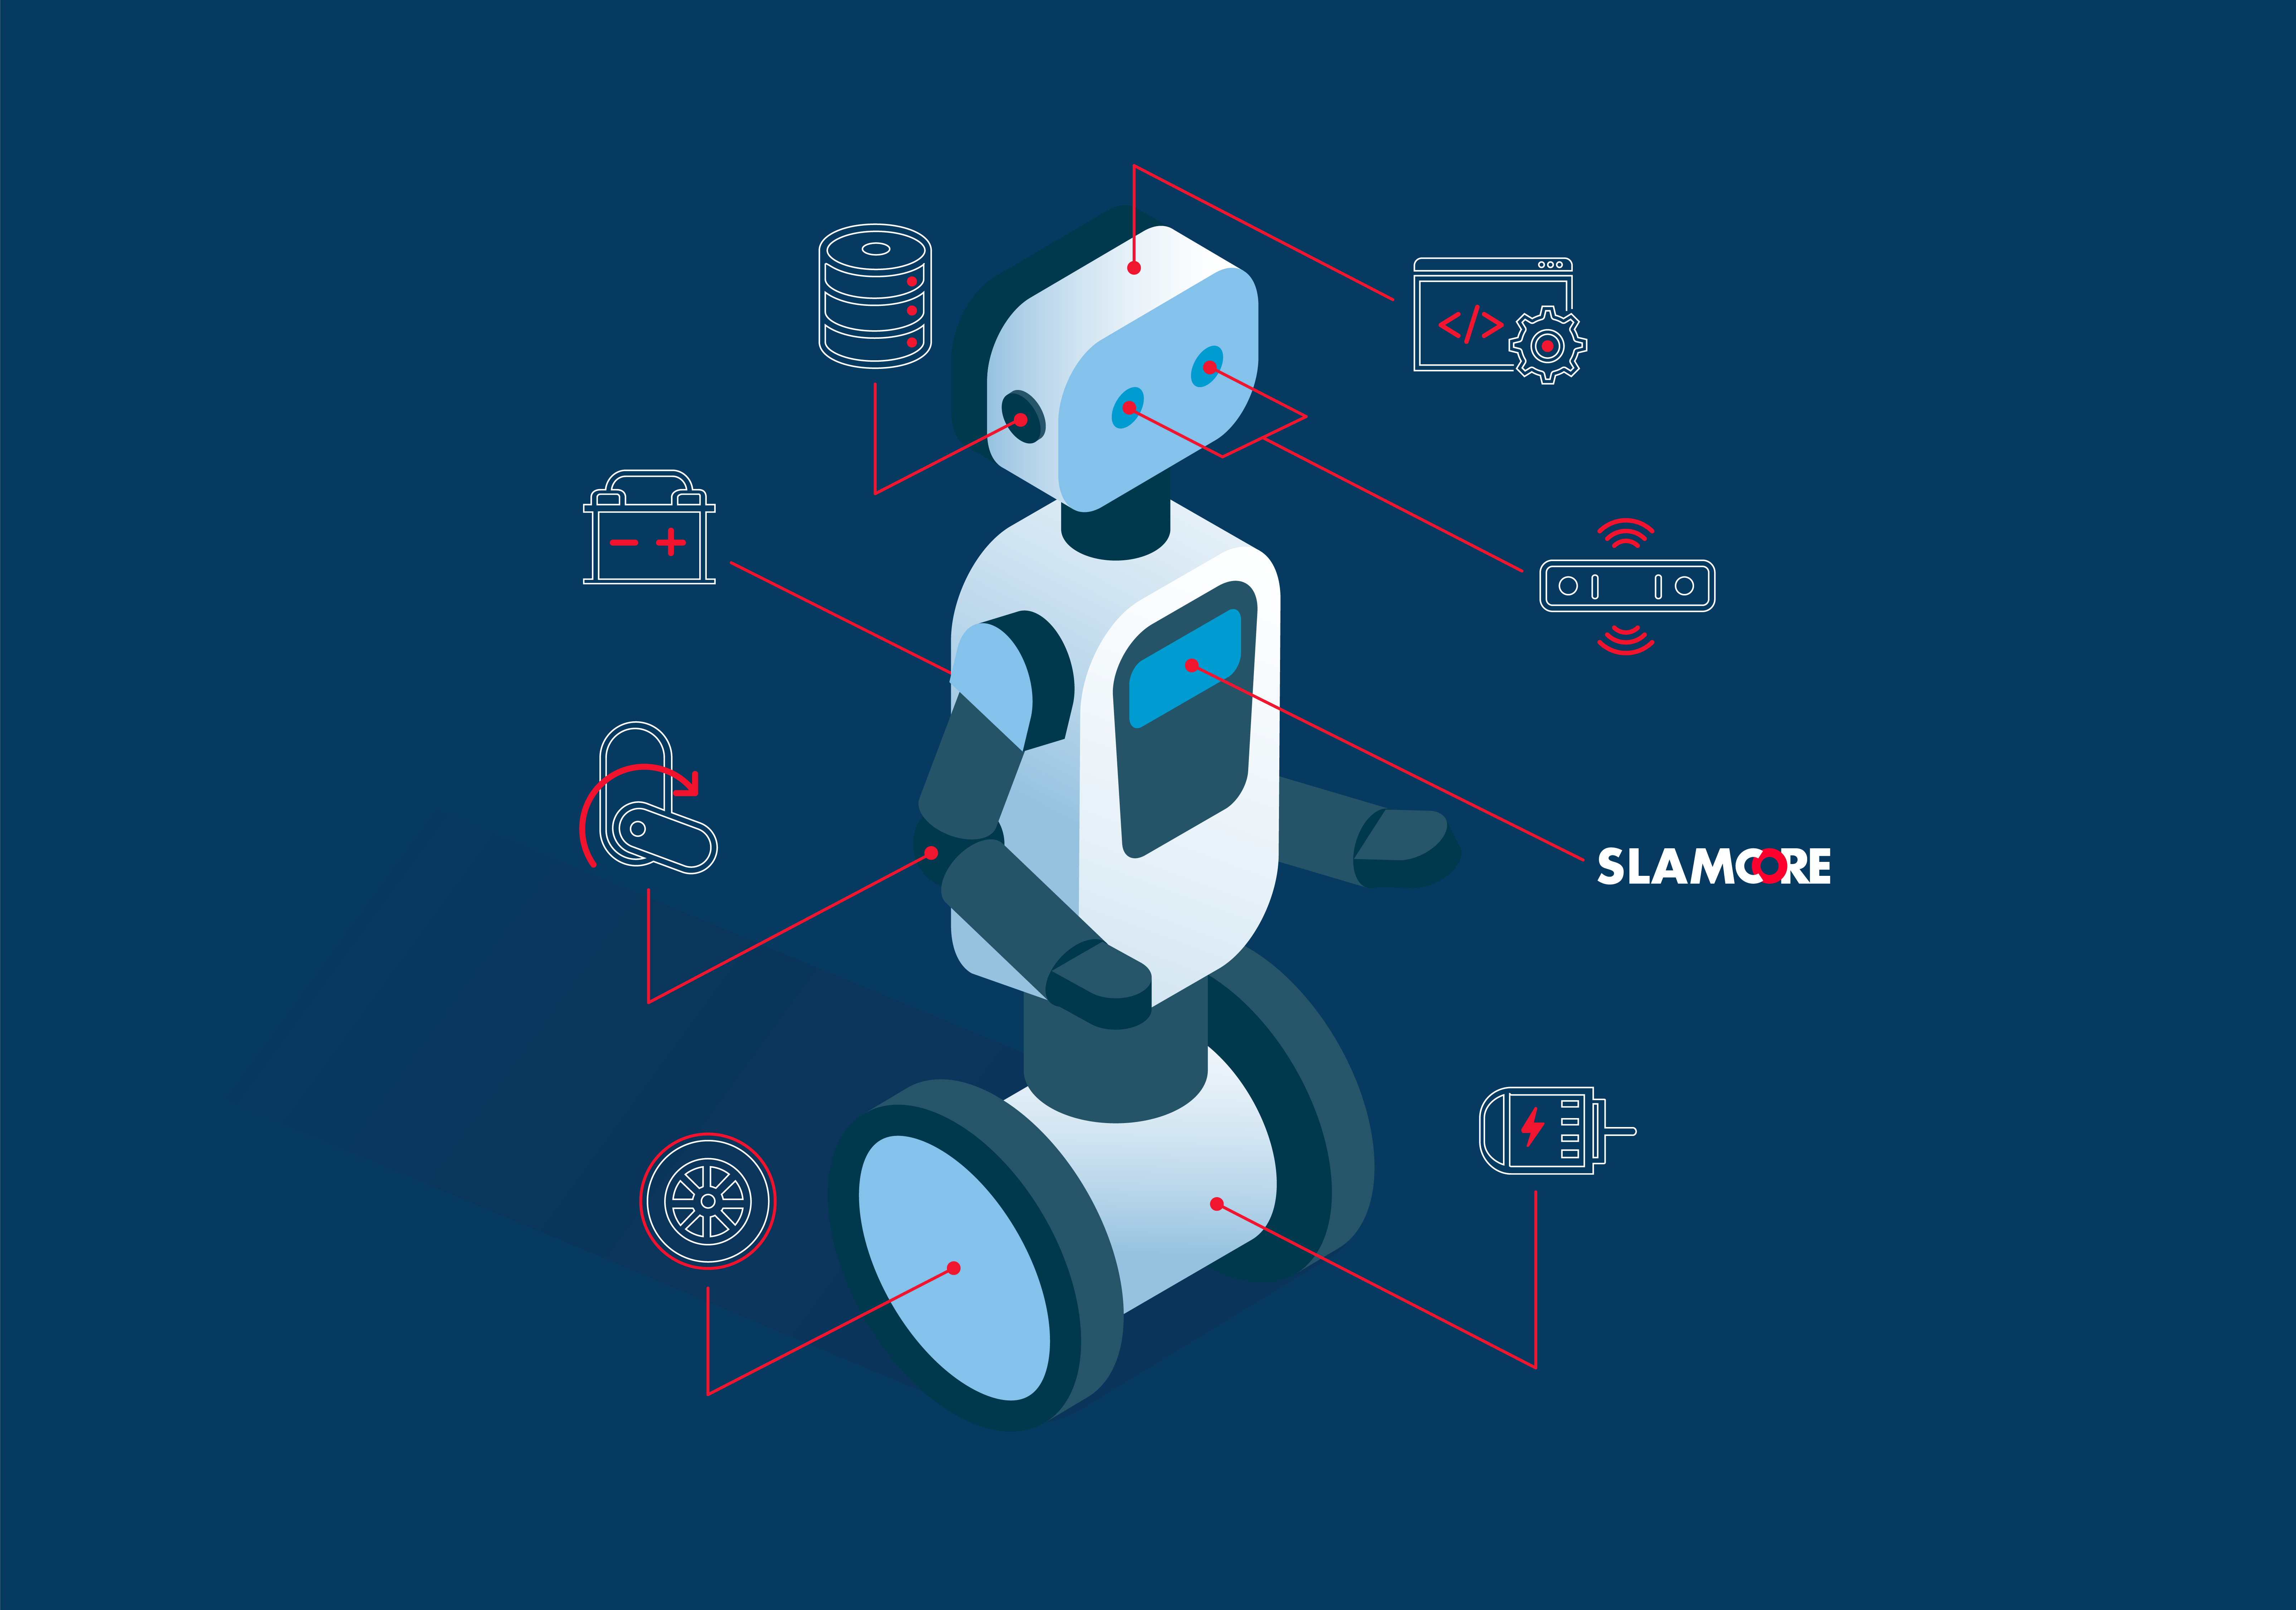 Slamcore-blog-2-02